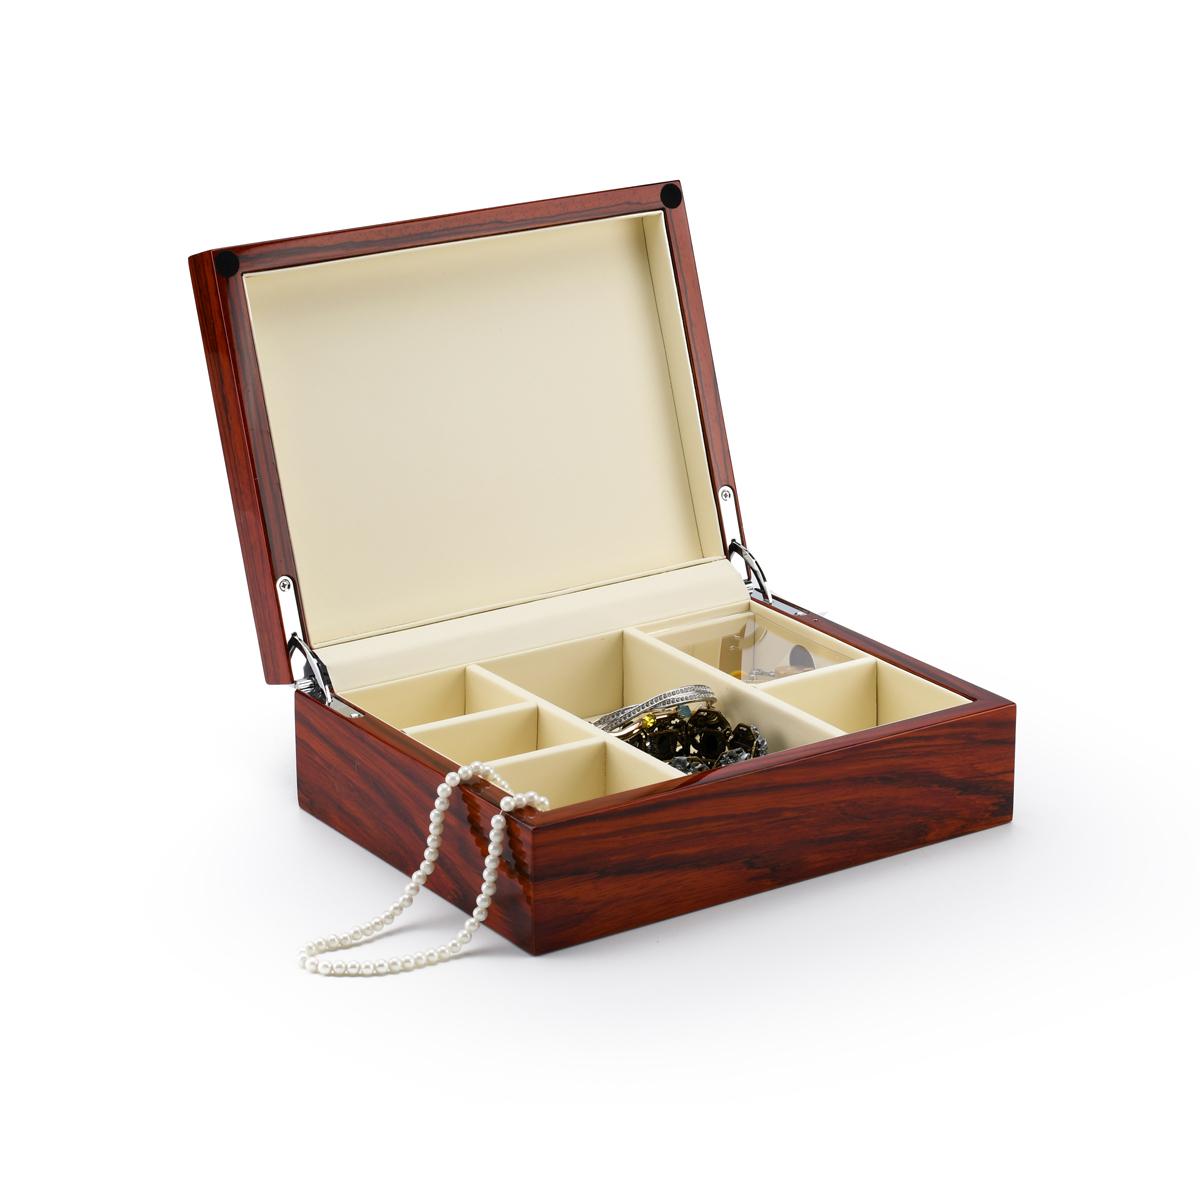 Ultra-Sleek 18 Note Hi Gloss Zebra Striped Wood Finish Jewelry Box